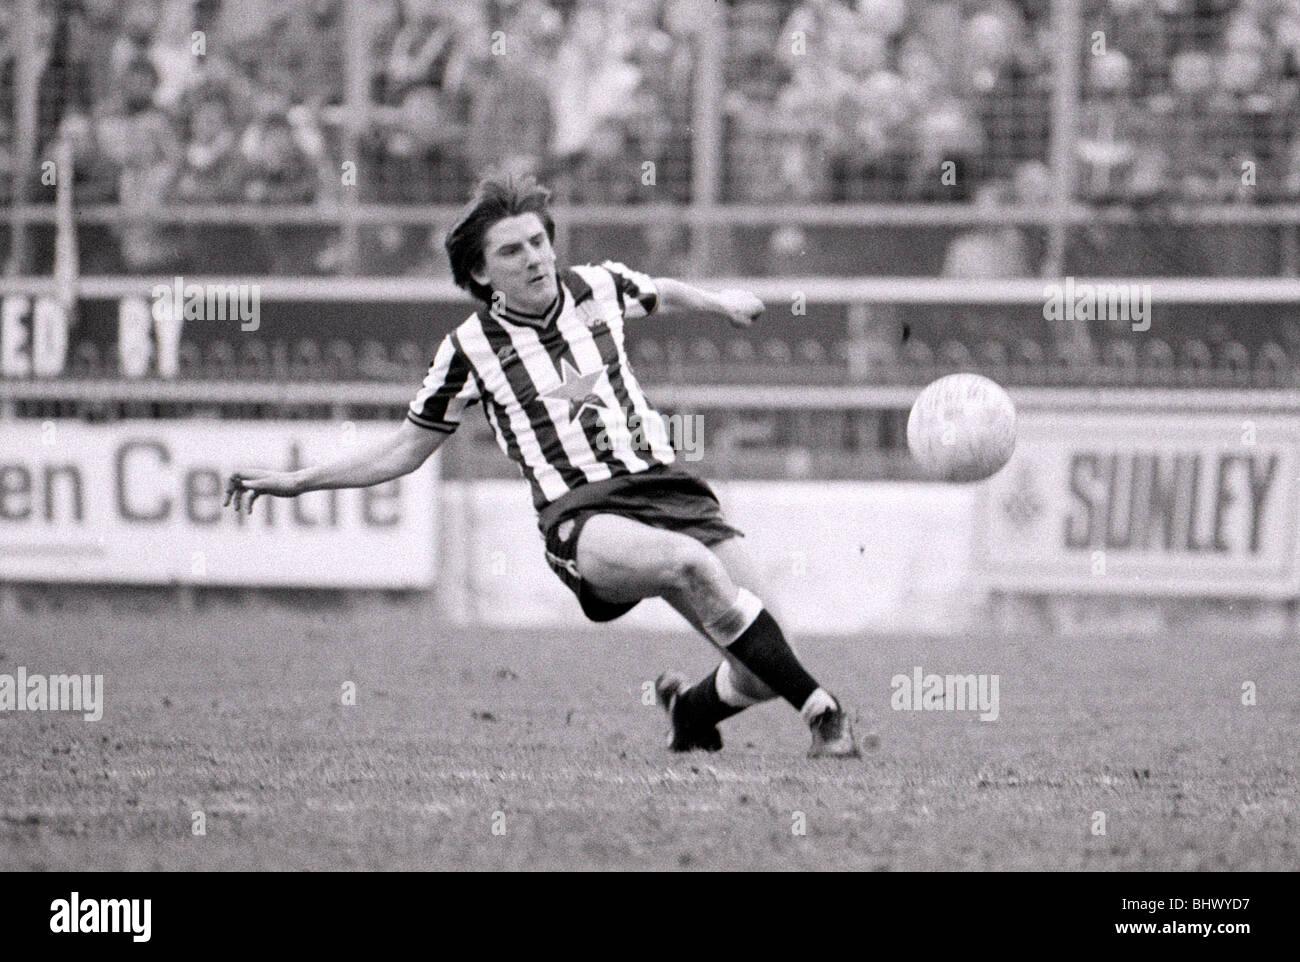 Avril 1984 Charlton Athletic v Newcastle United Football joueur de football des années 1980, Peter Beardsley Photo Stock